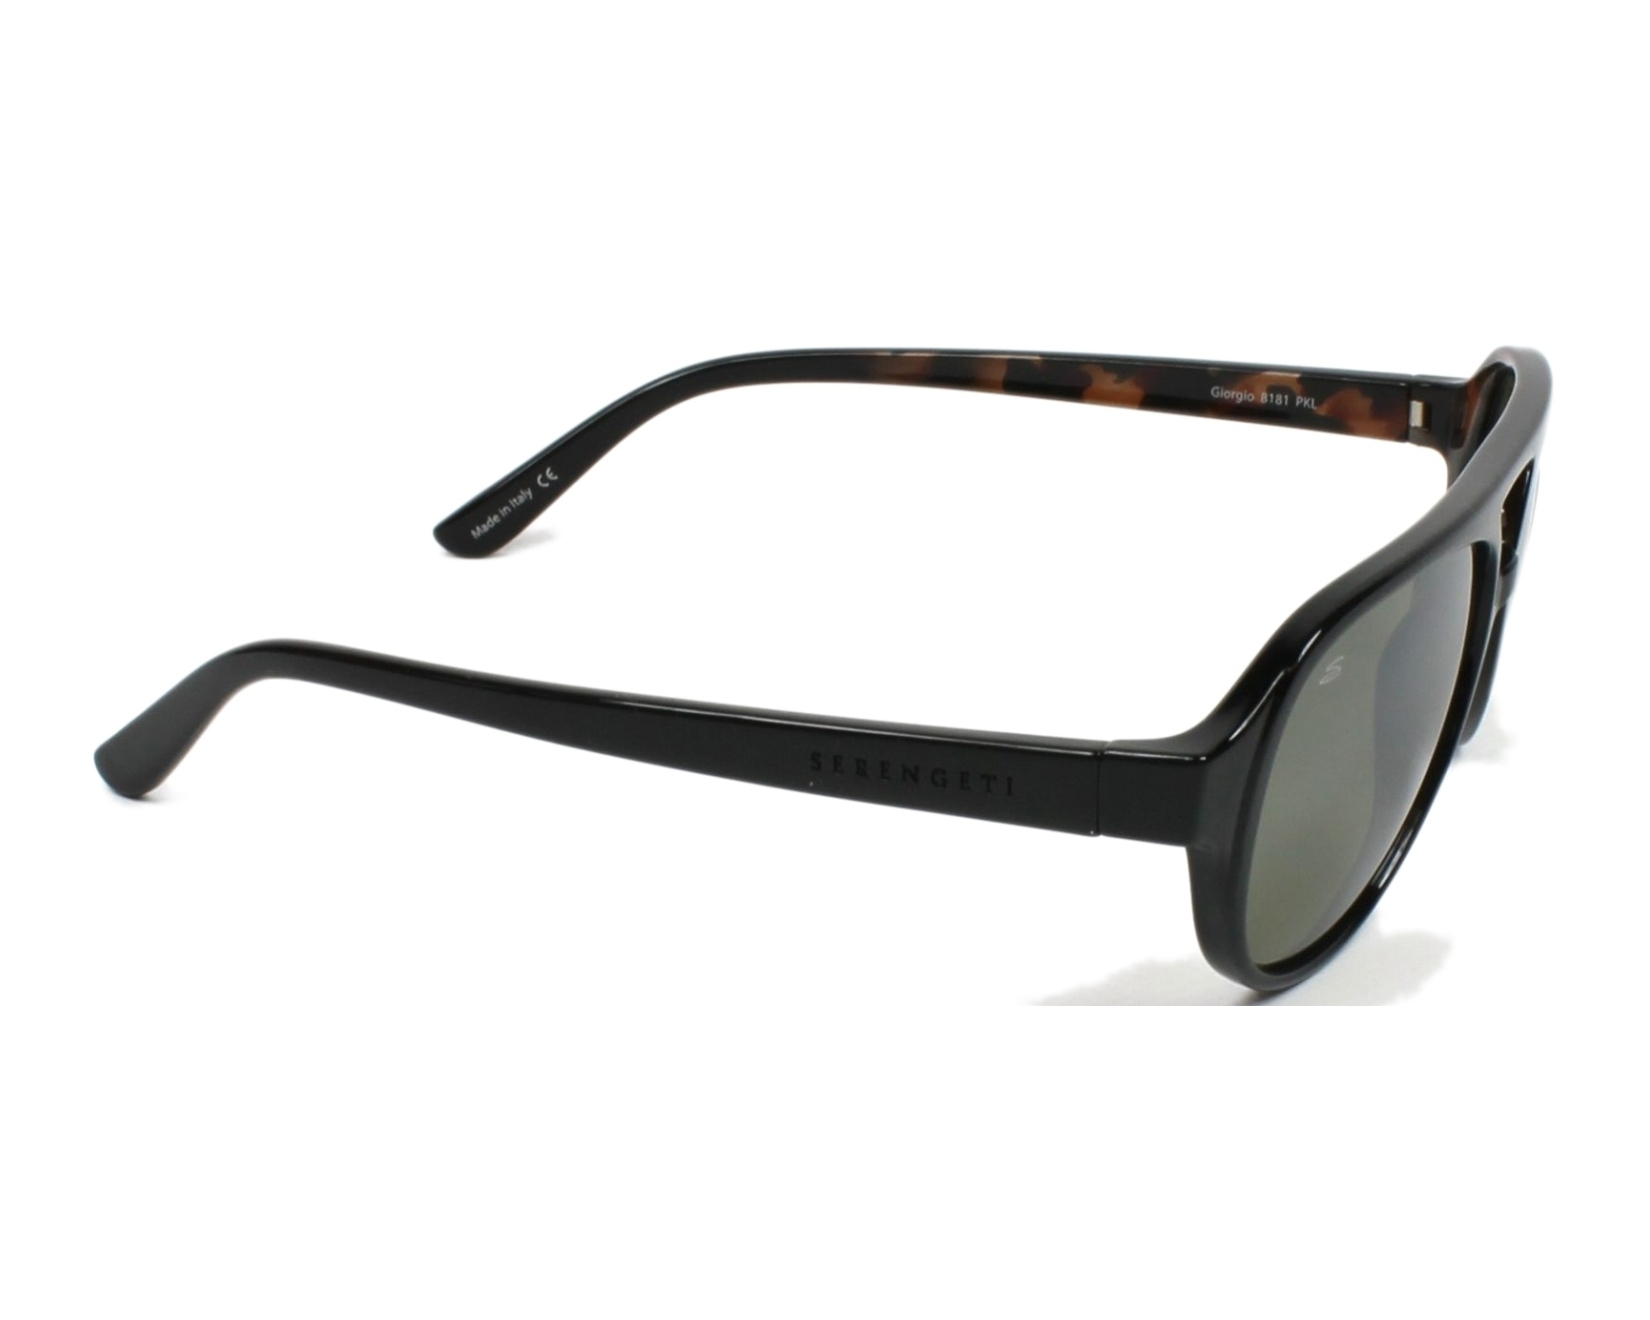 28106f376bb Sunglasses Serengeti GIORGIO 8181 58-16 Black side view